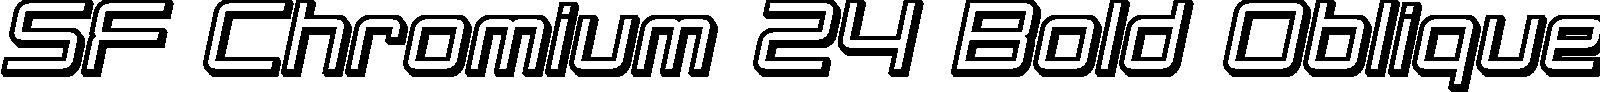 SF Chromium 24 Bold Oblique title image